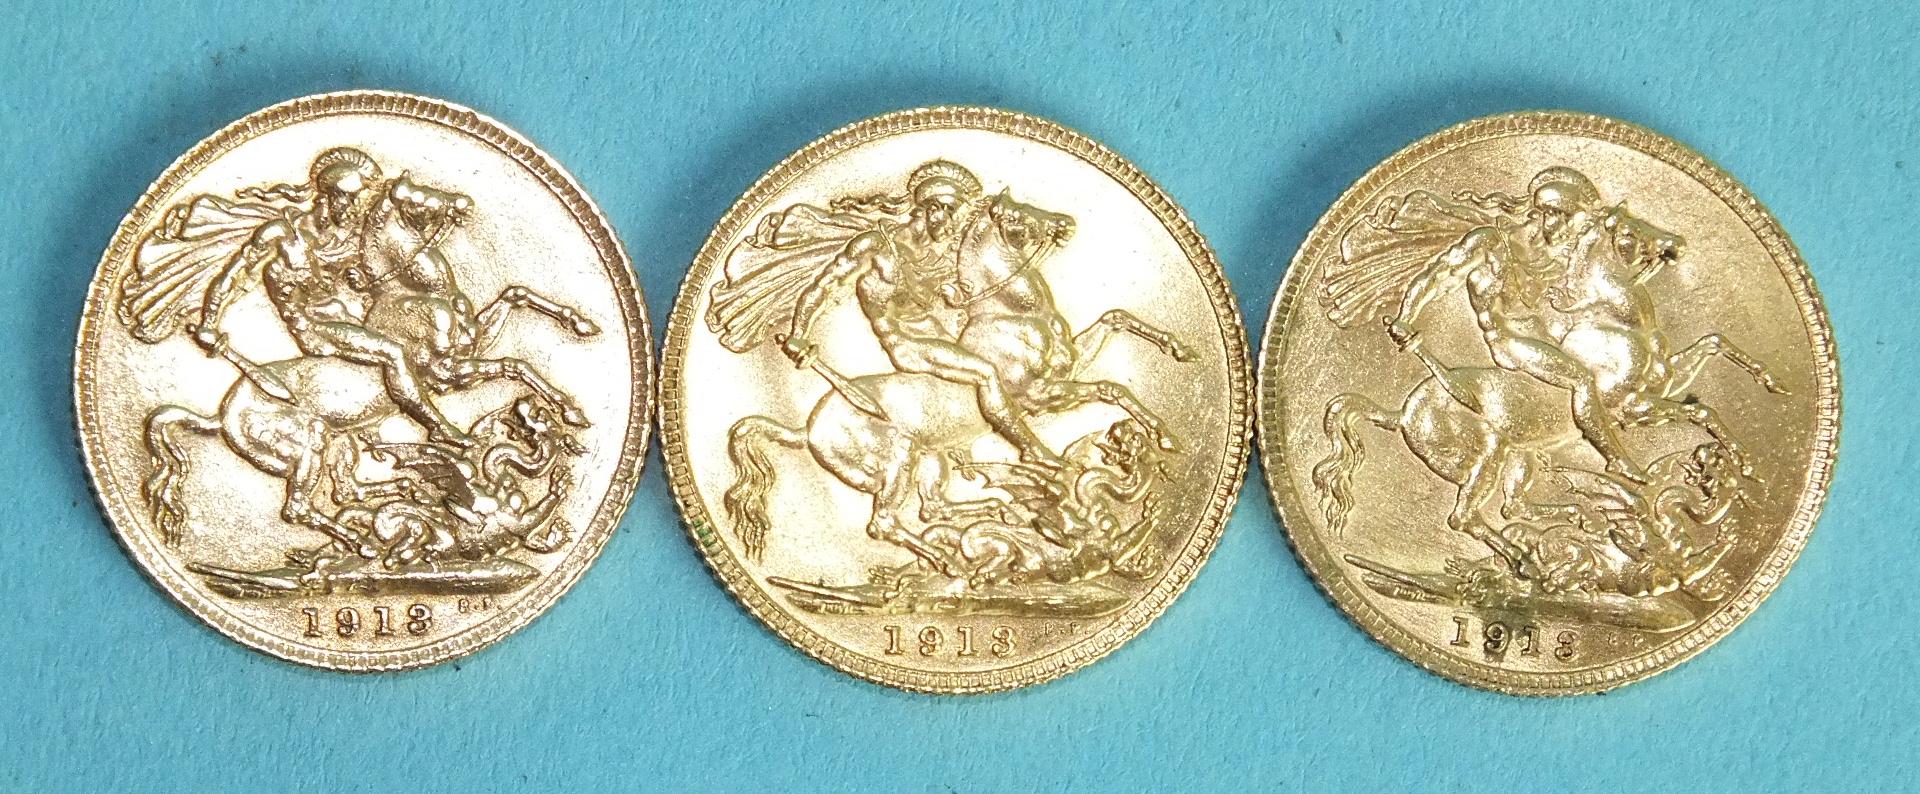 Lot 375 - Three George V 1913 sovereigns, (3).